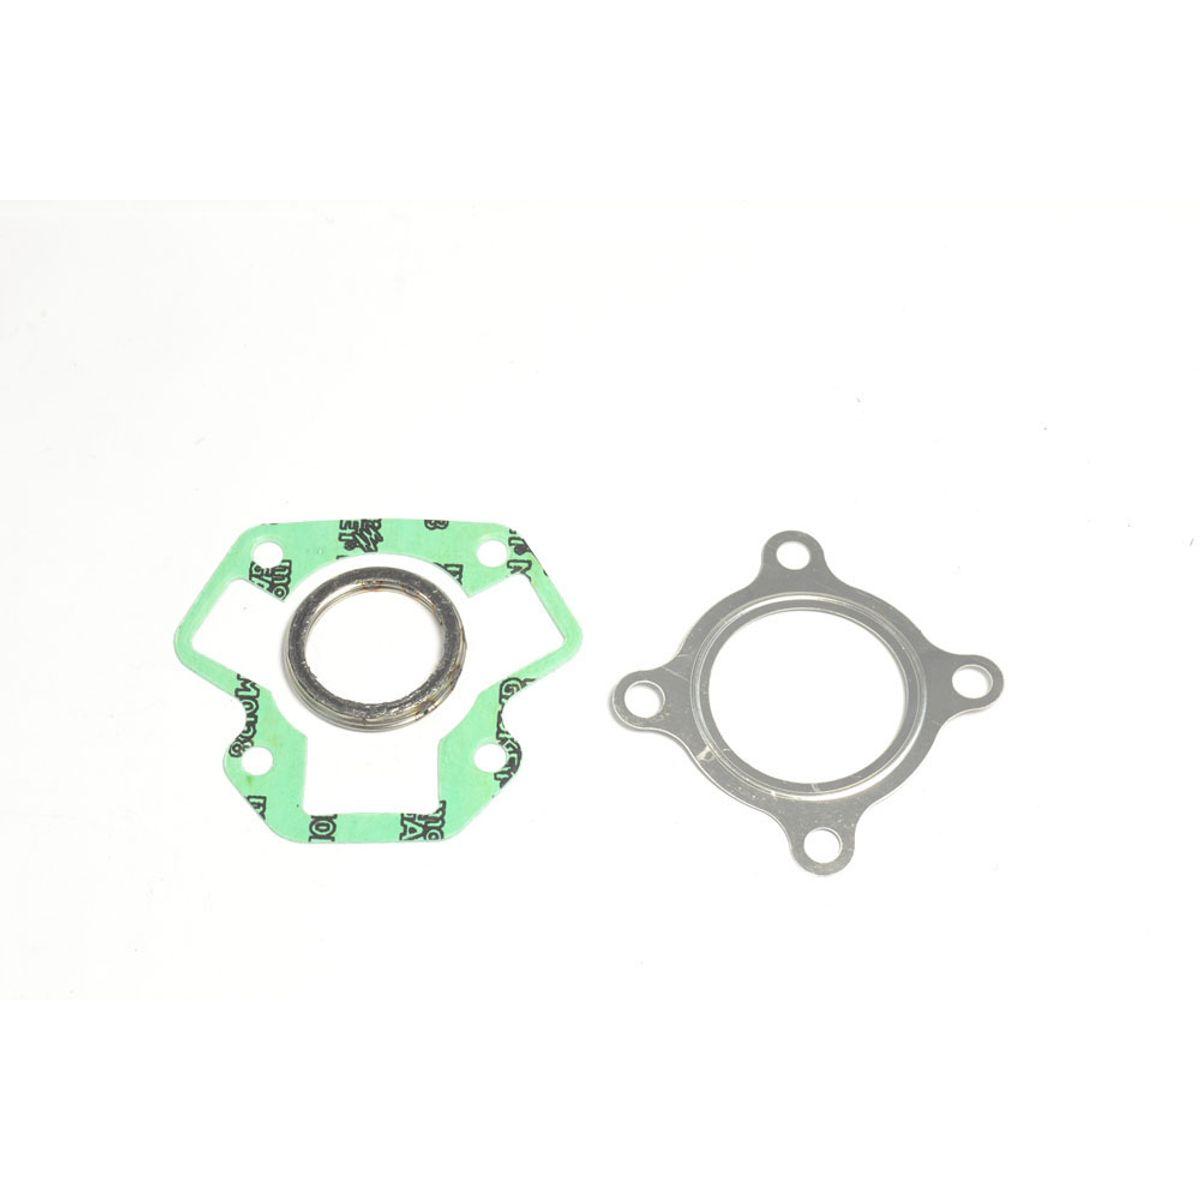 Athena P400485600018 Top End Gasket Kit